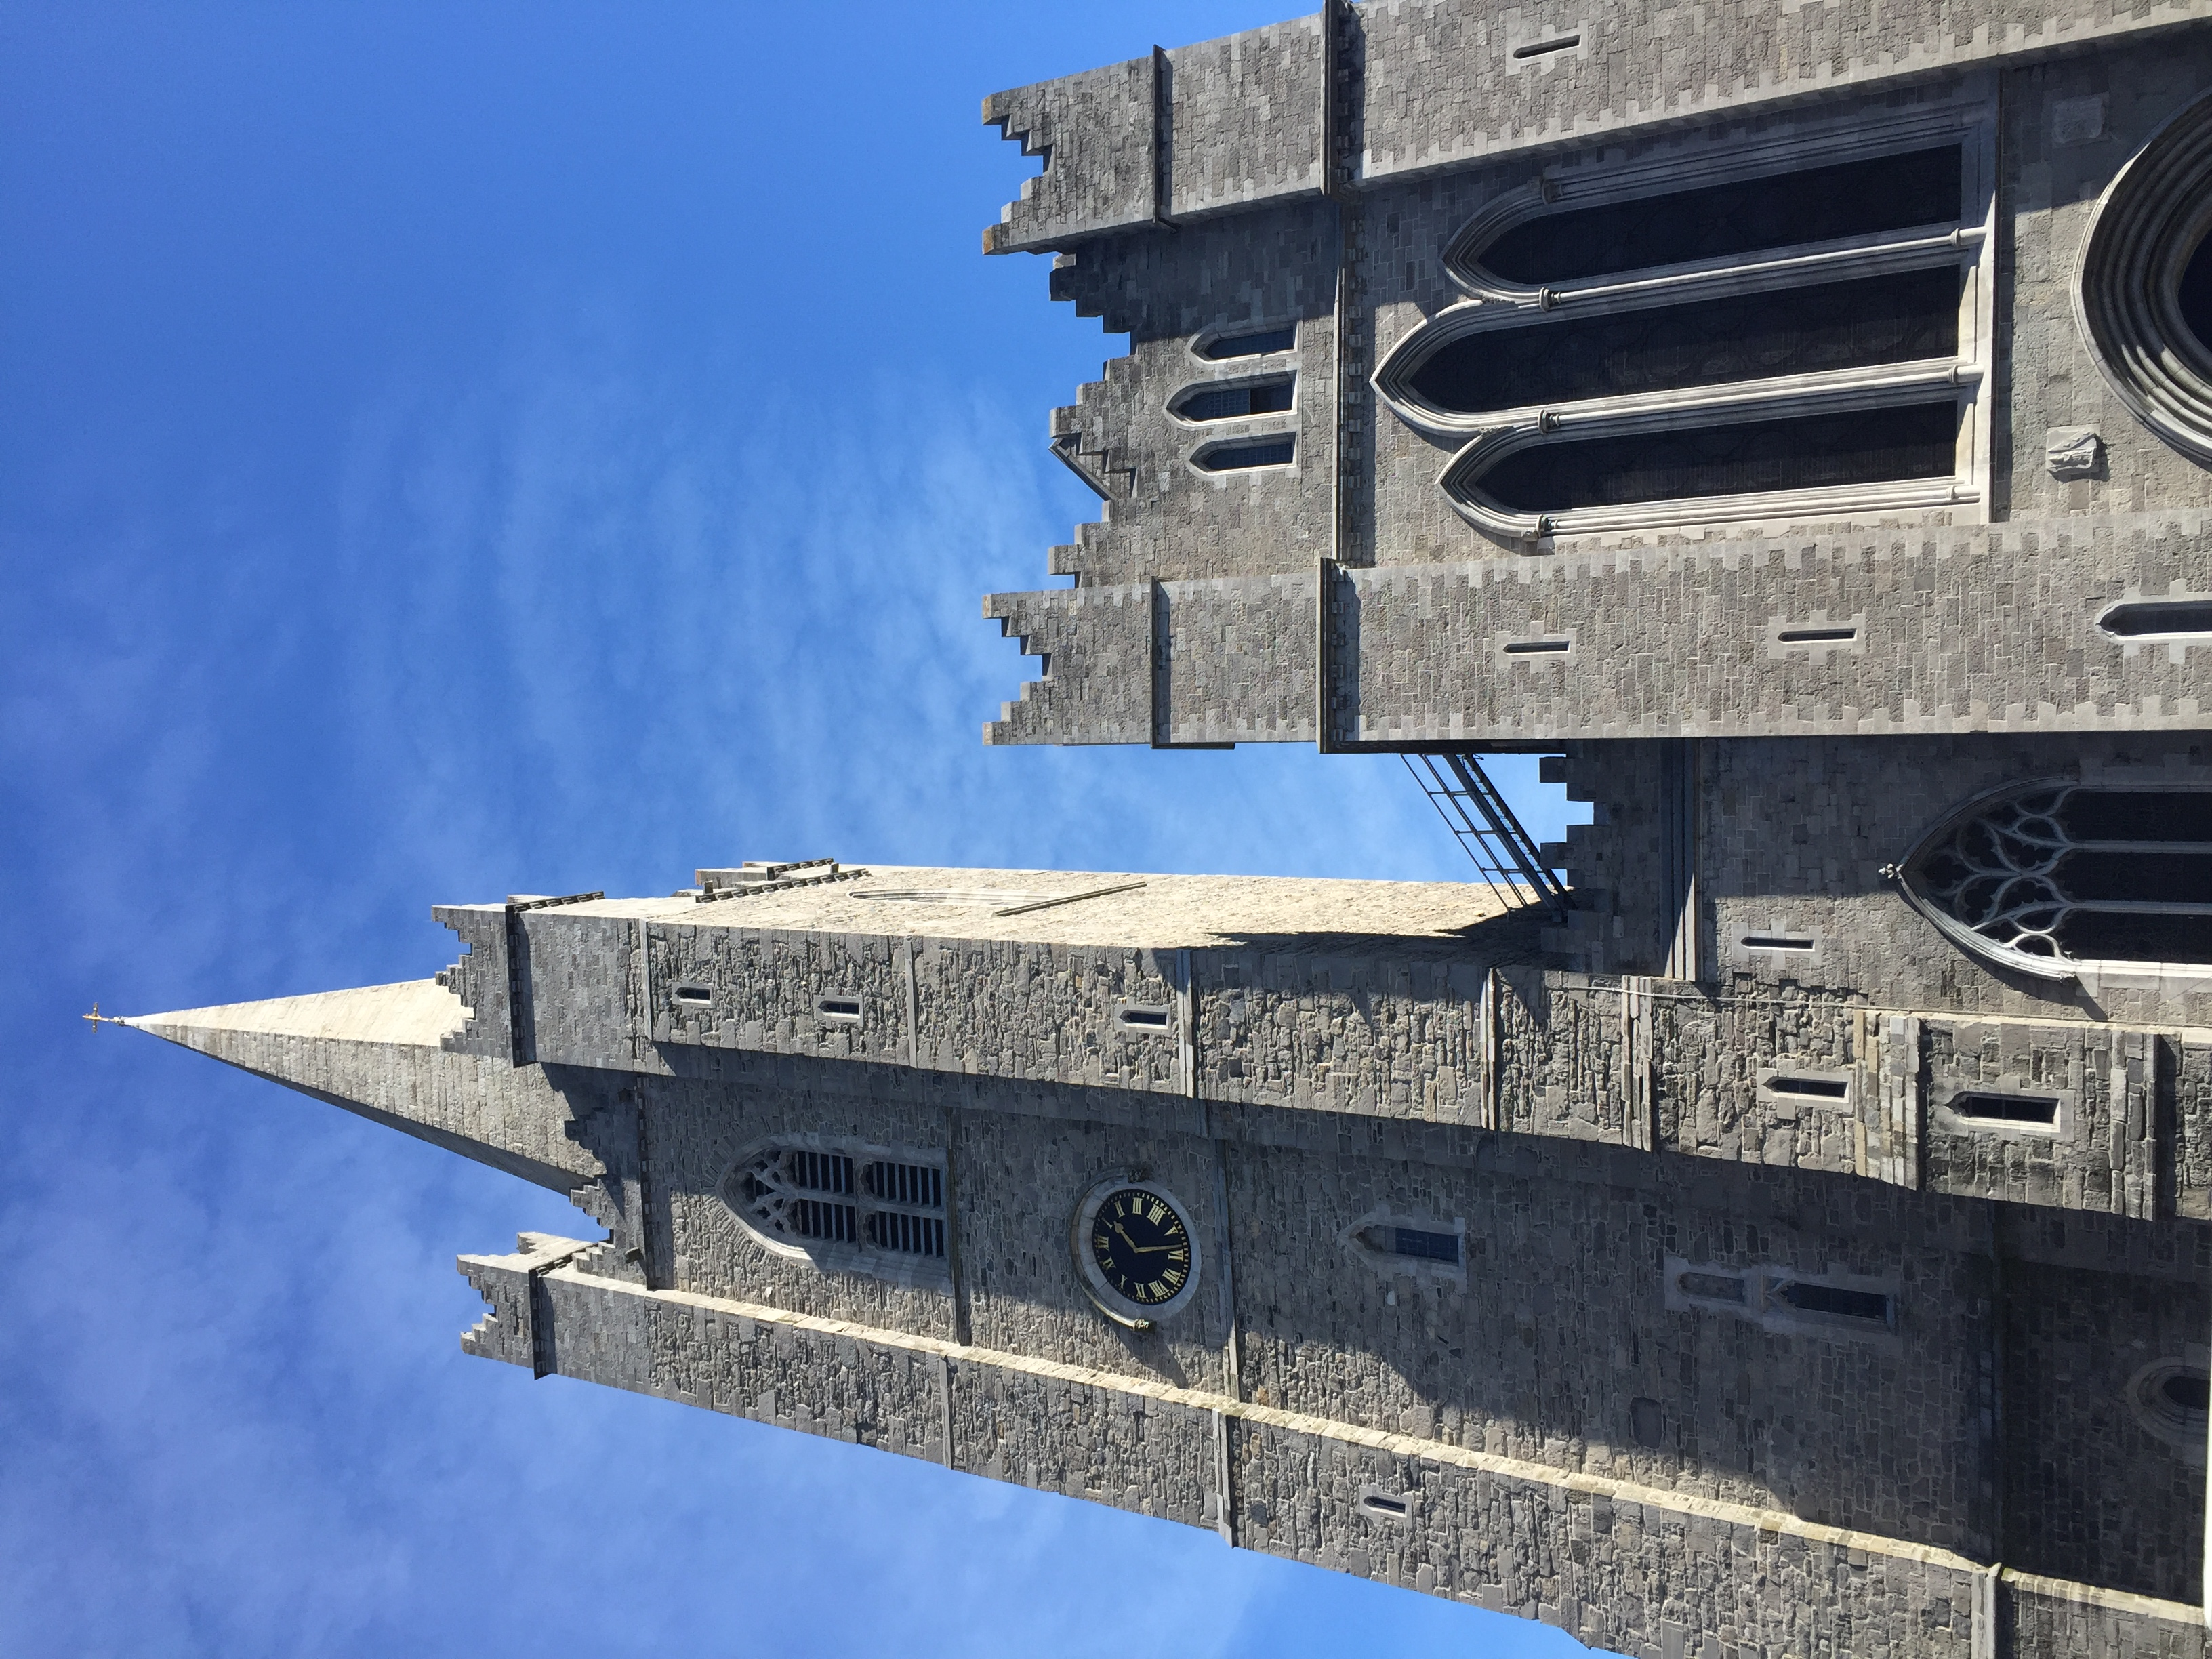 Saint Patrick's in Ireland